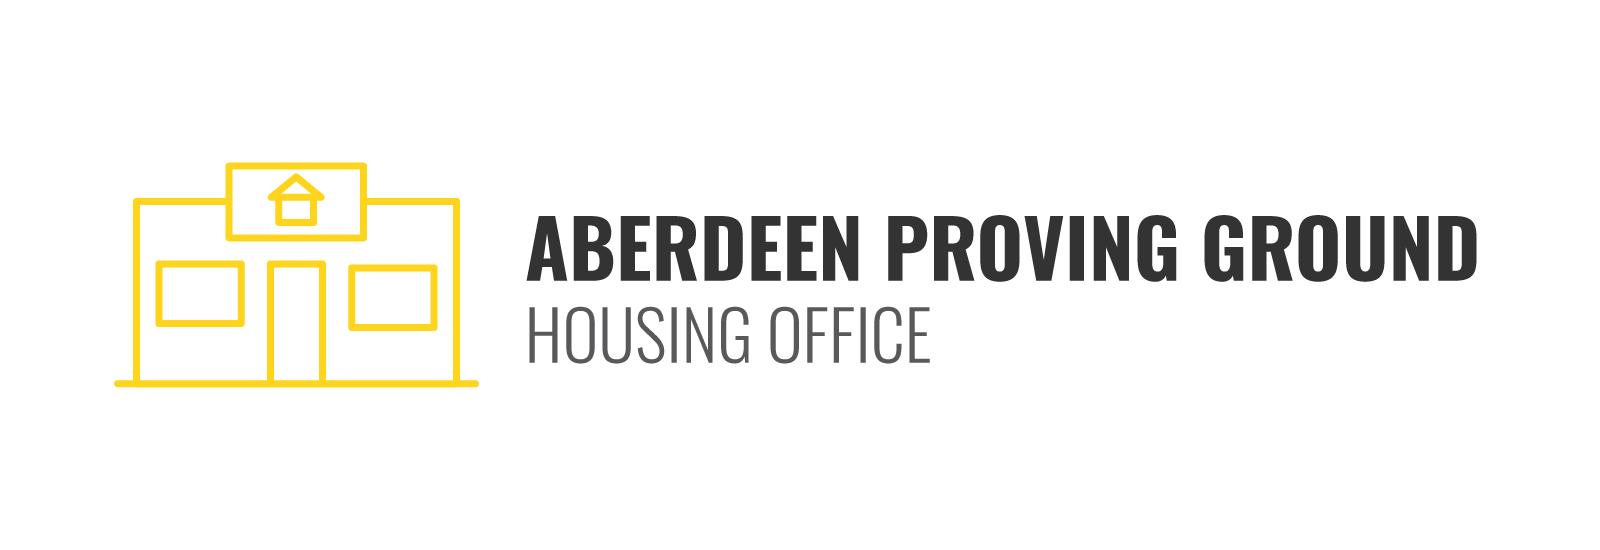 Aberdeen Proving Ground Housing Office